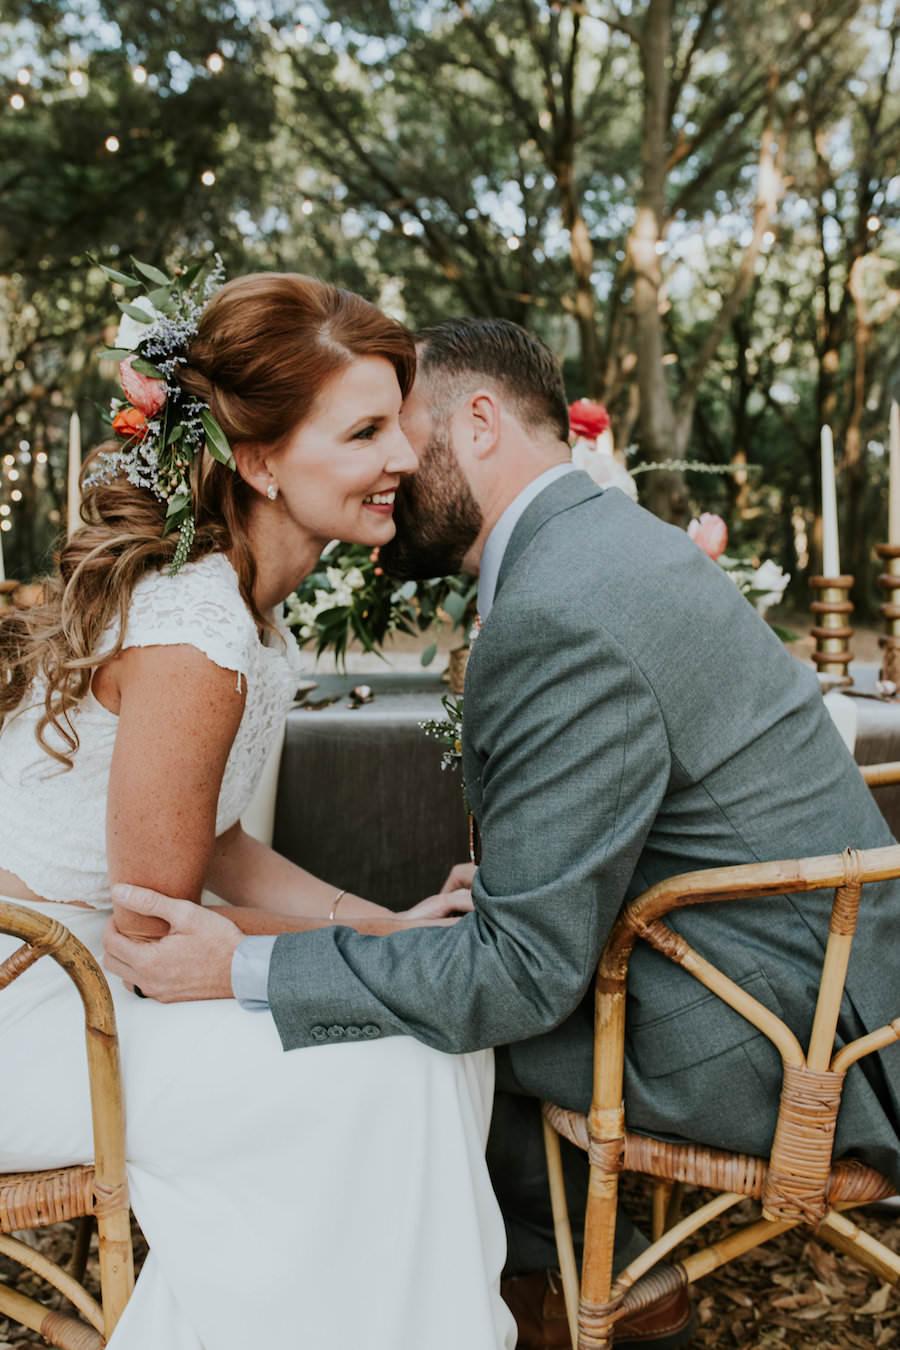 Bride and Groom Wedding Portrait   Retro Vintage Boho Wedding Inspiration   Planner Glitz Events   Outdoor Venue Casa Lantana